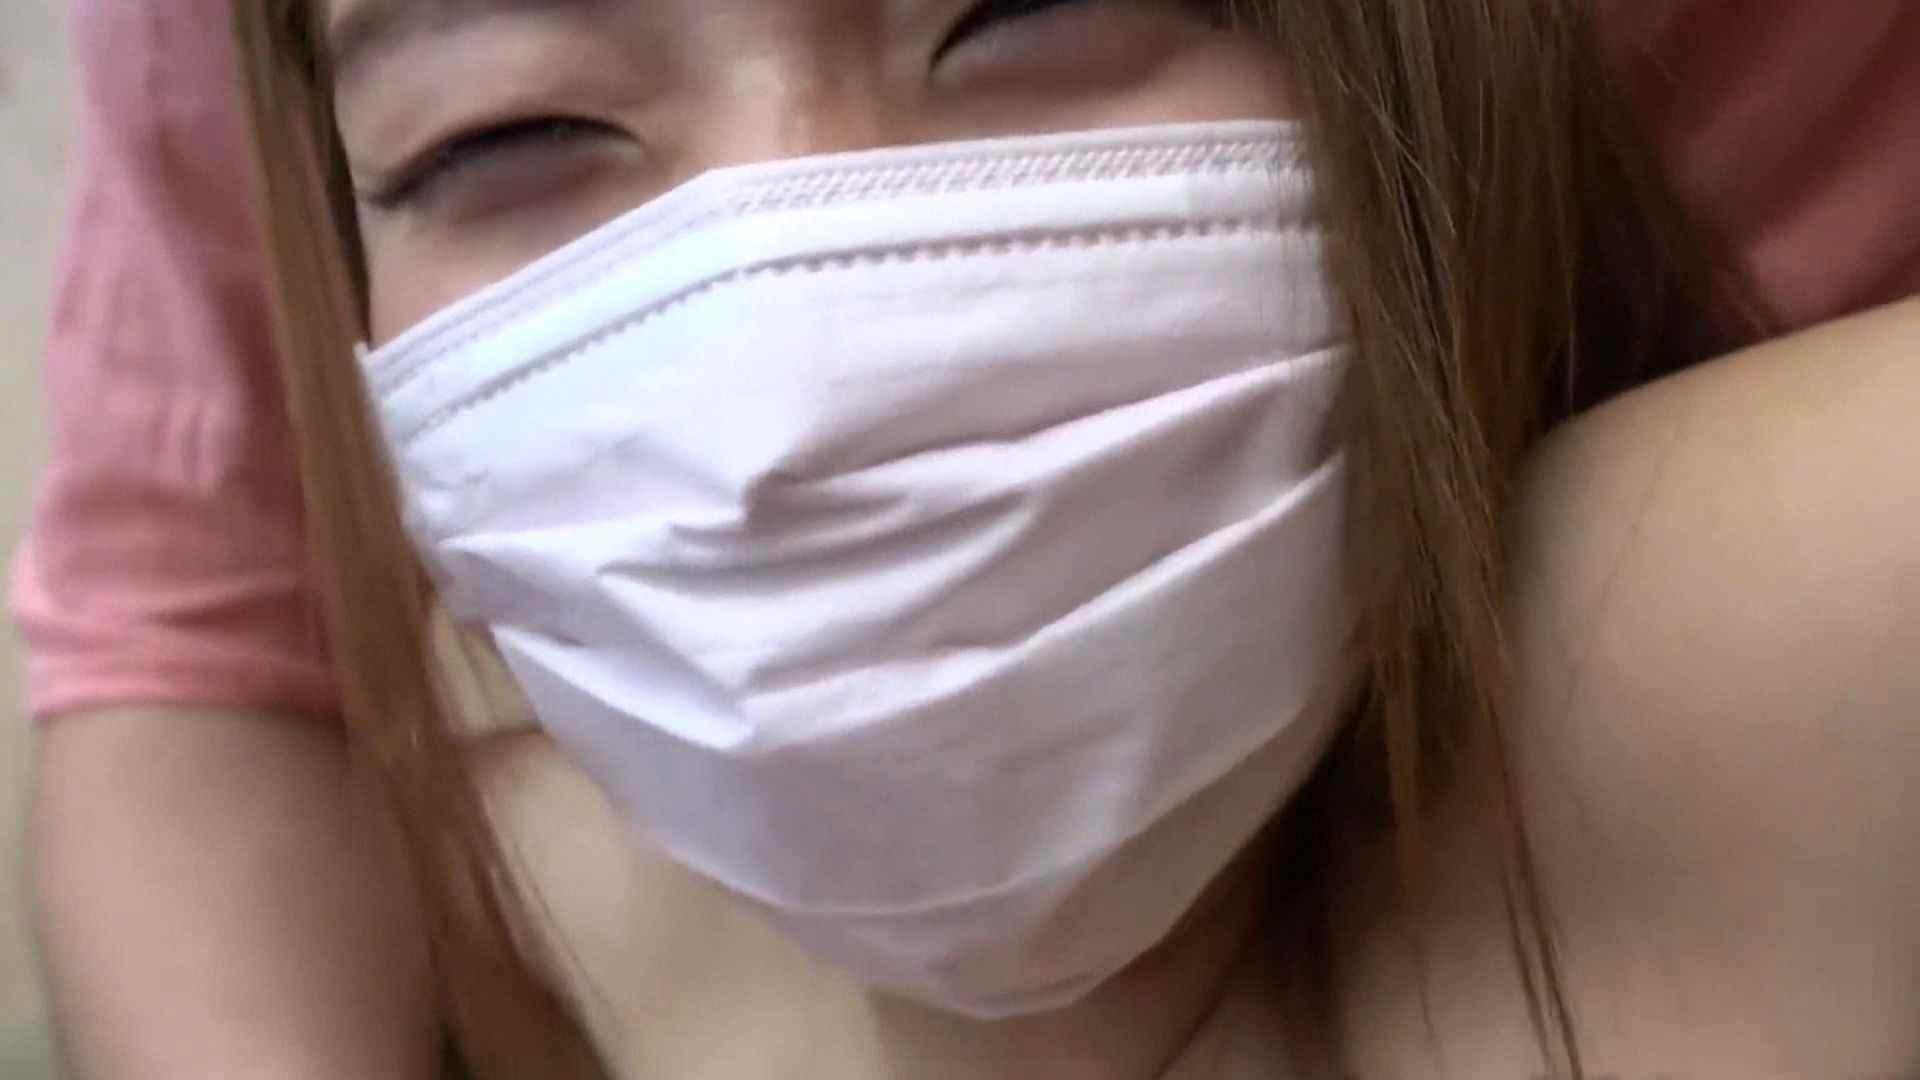 S級厳選美女ビッチガールVol.40 前編 美女 | モデル  34連発 16